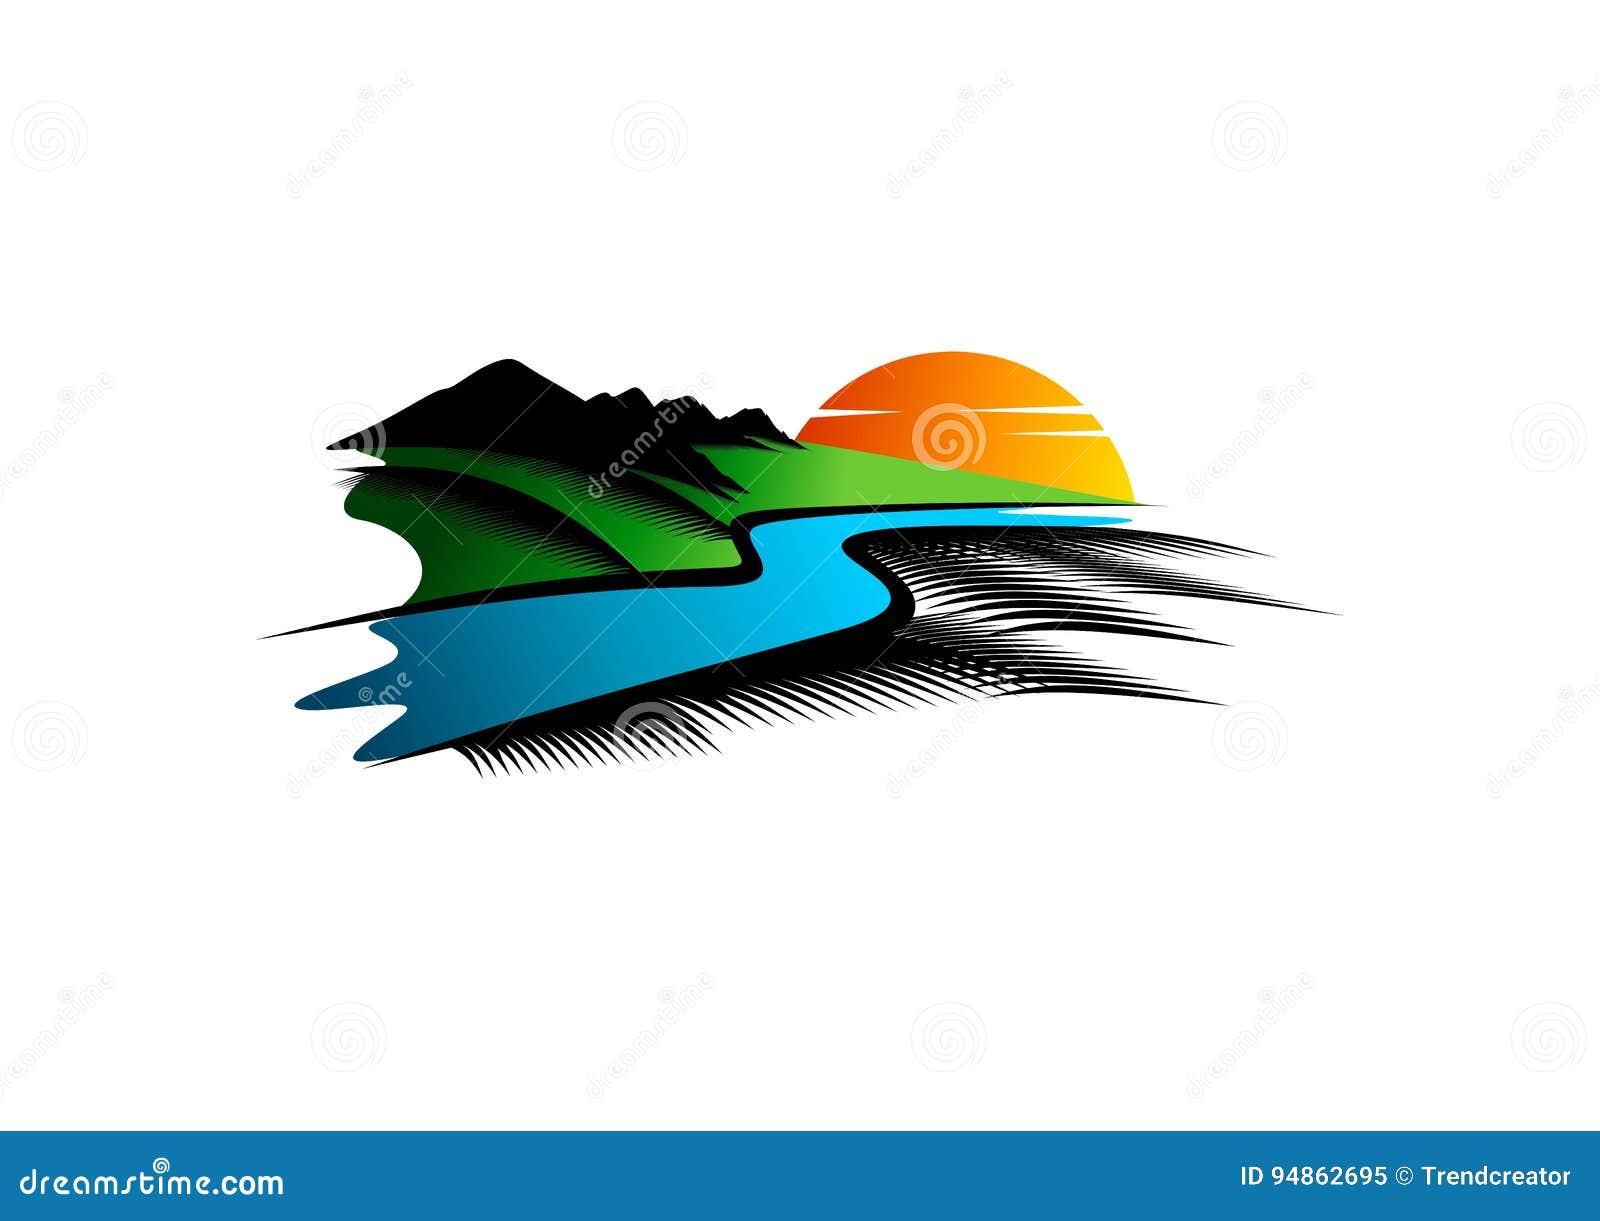 Landscape logo, river symbol, mountain illustration, nature parkland icon and view concept design